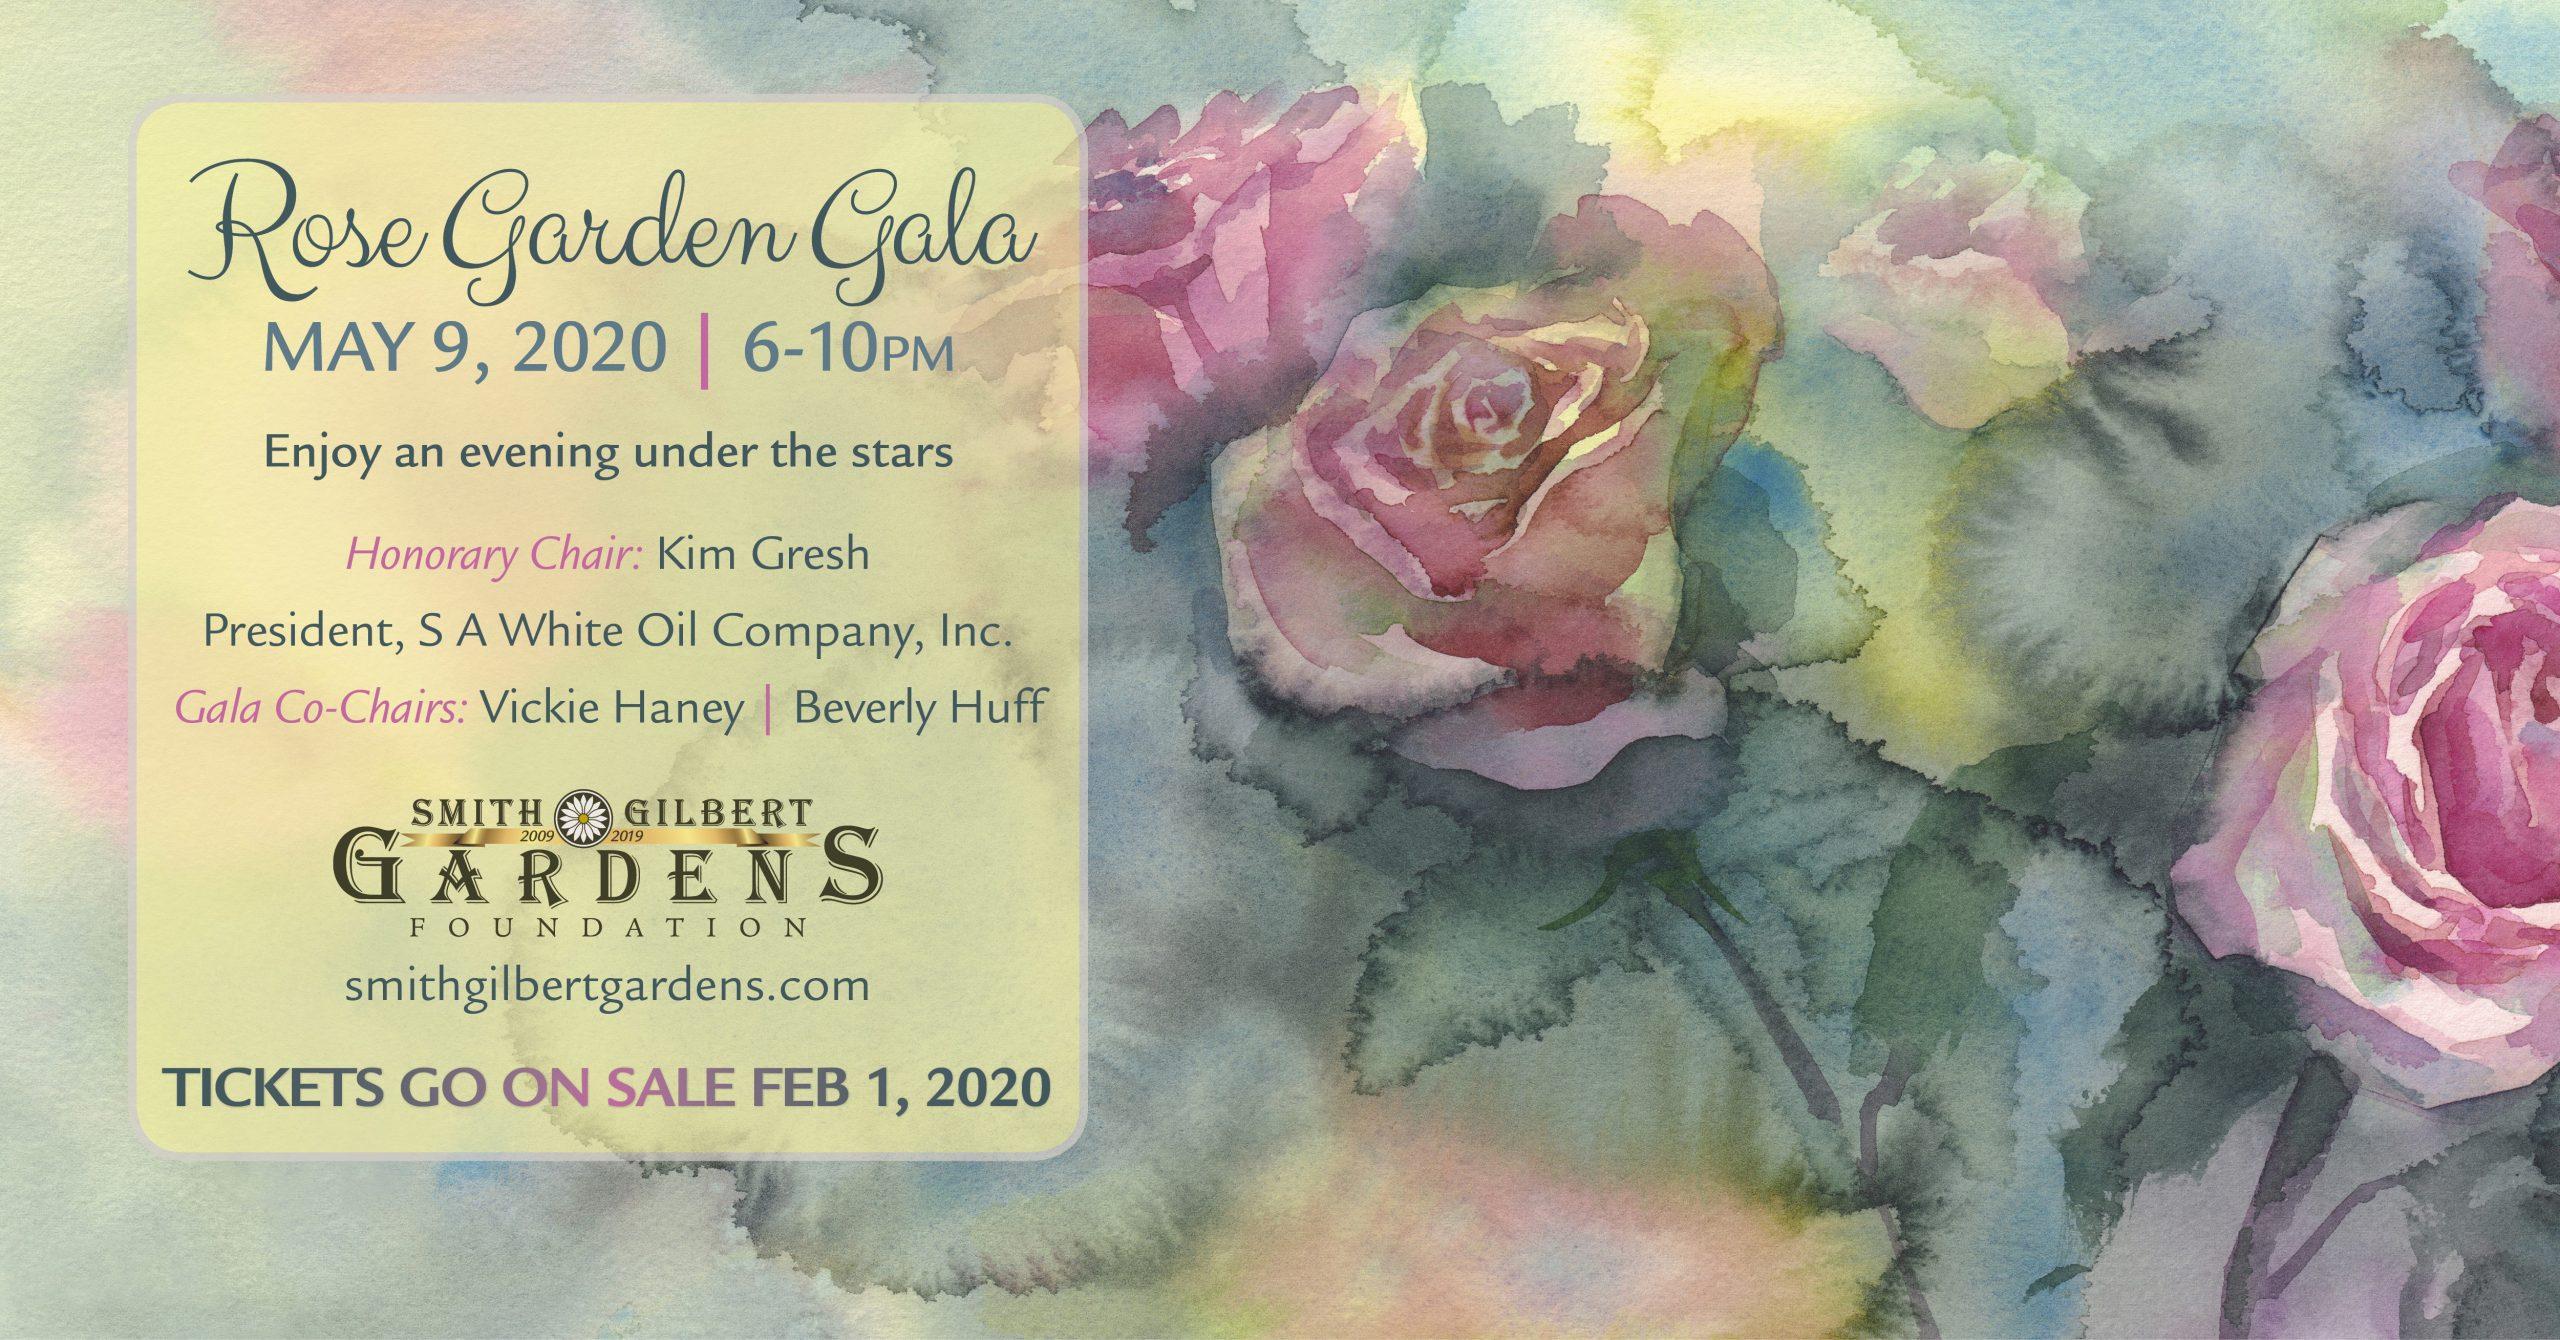 Rose Garden Gala 2020 banner